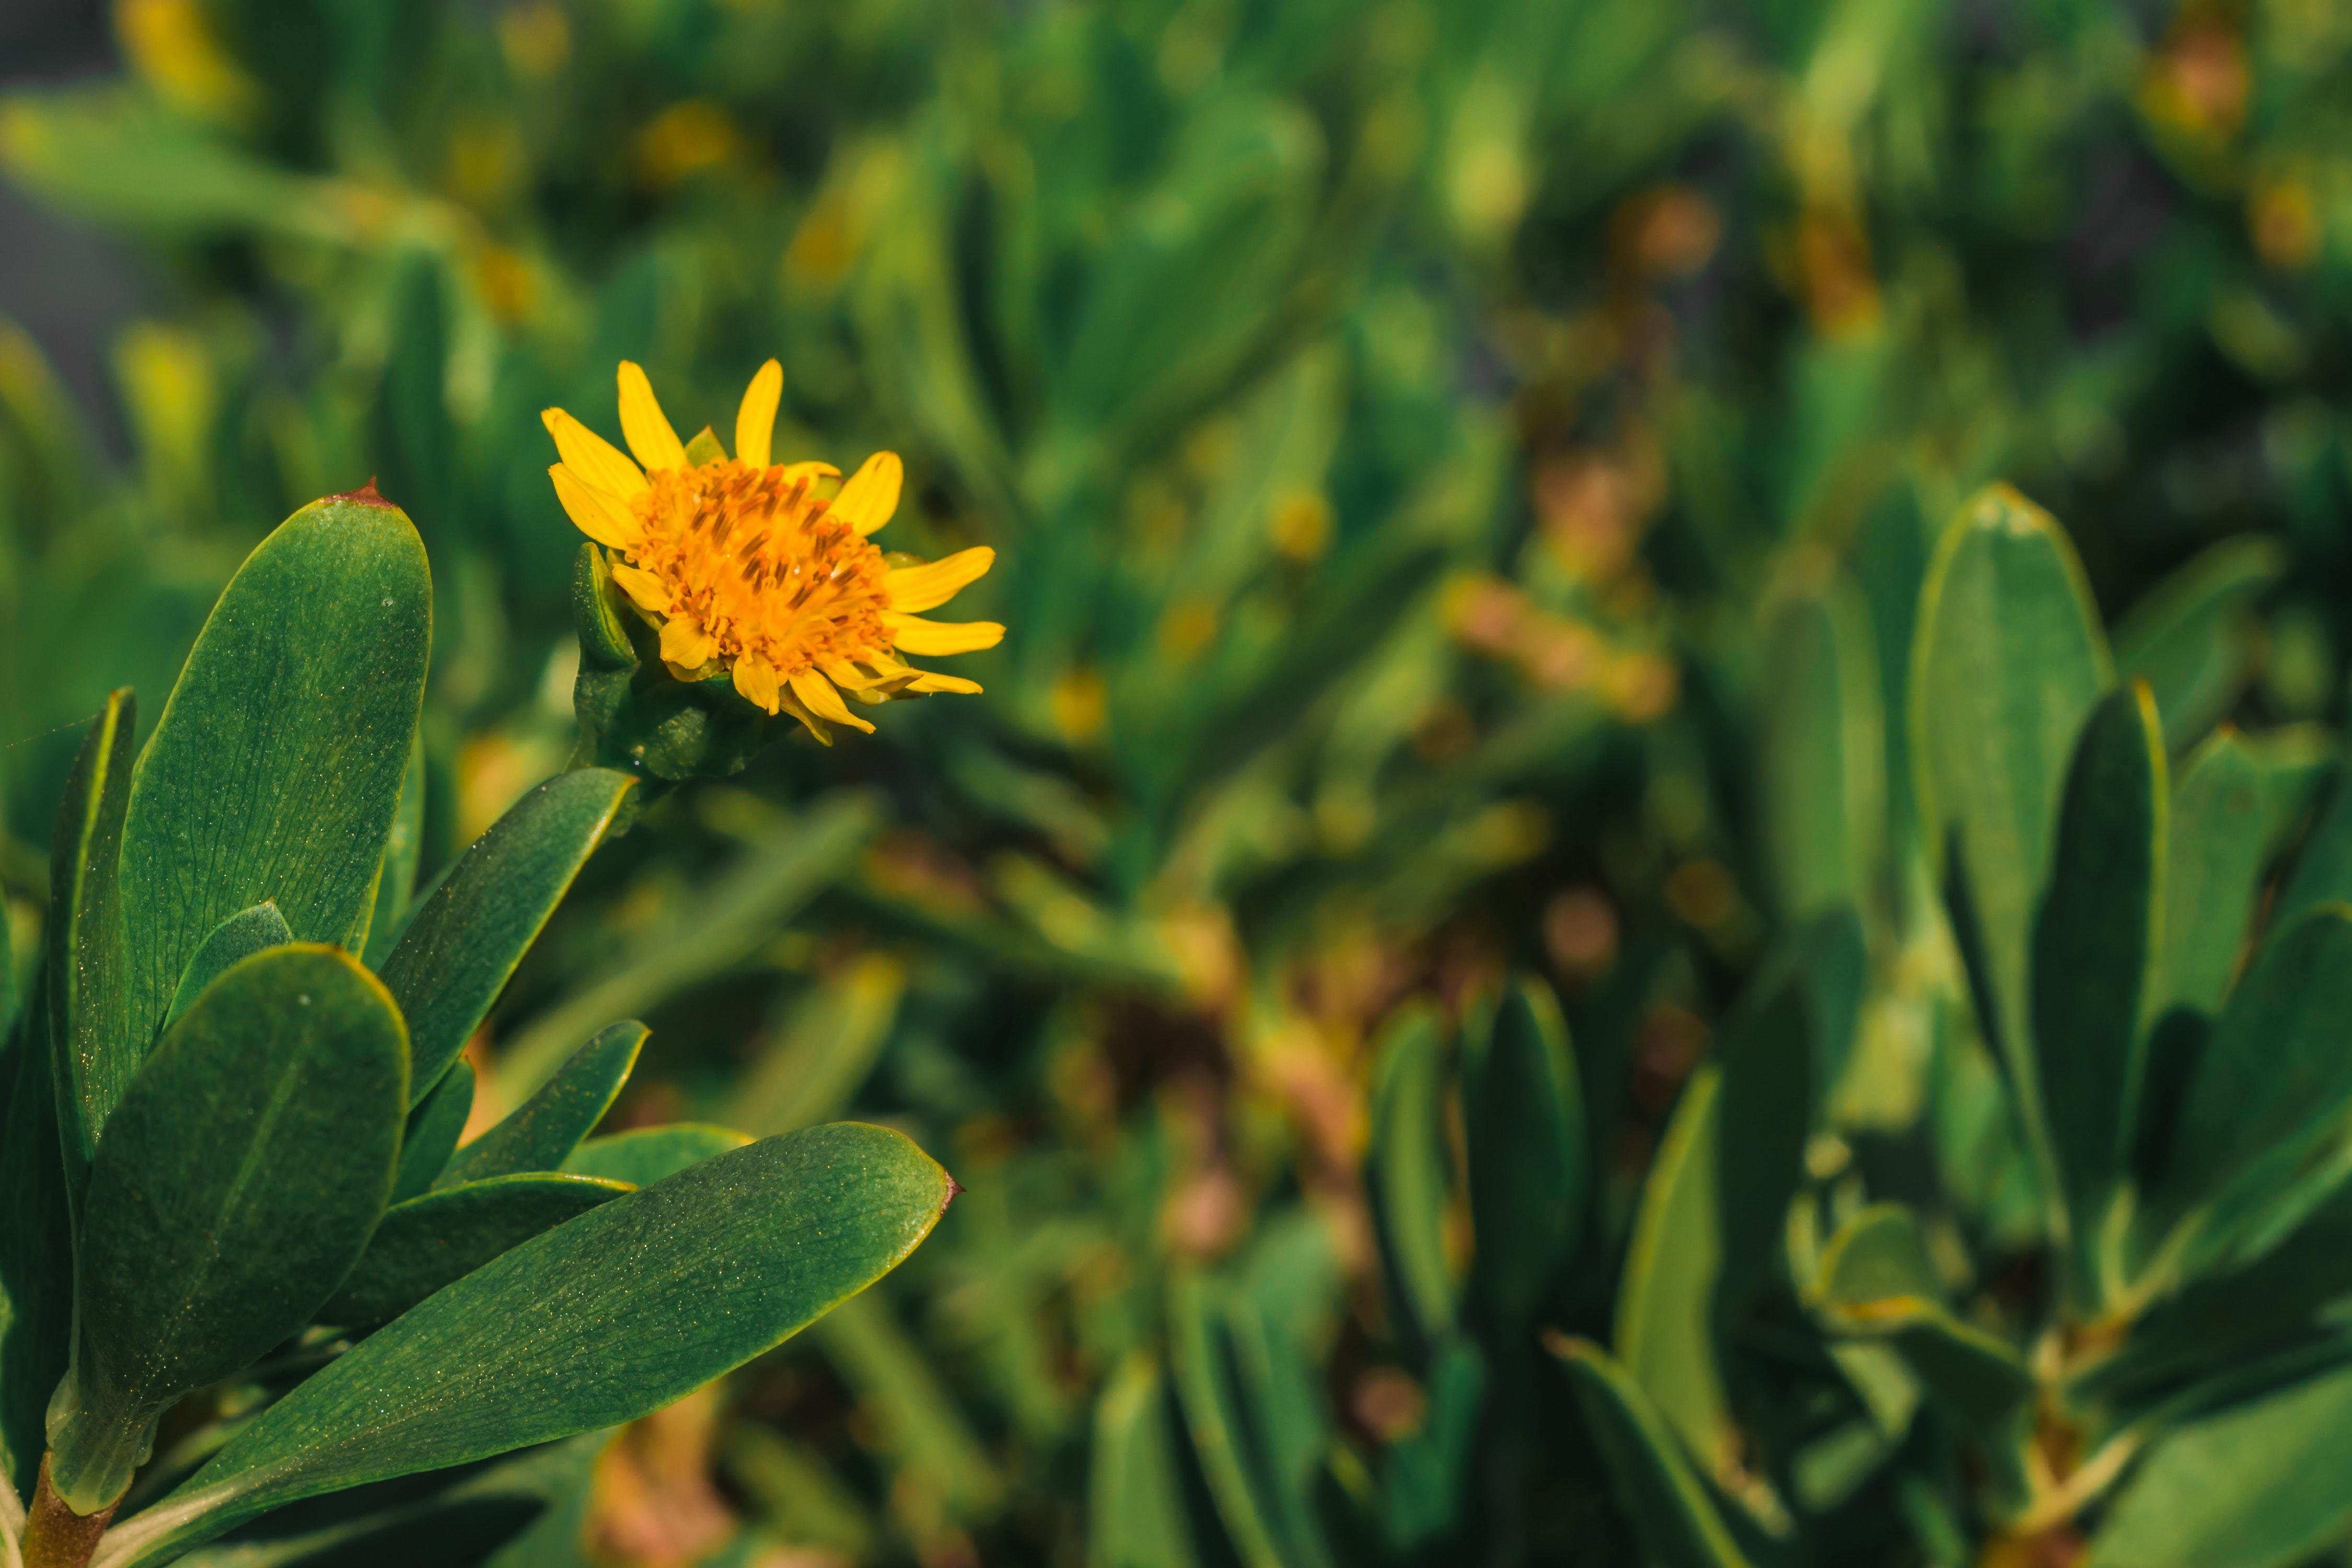 Yellow petaled flower photo